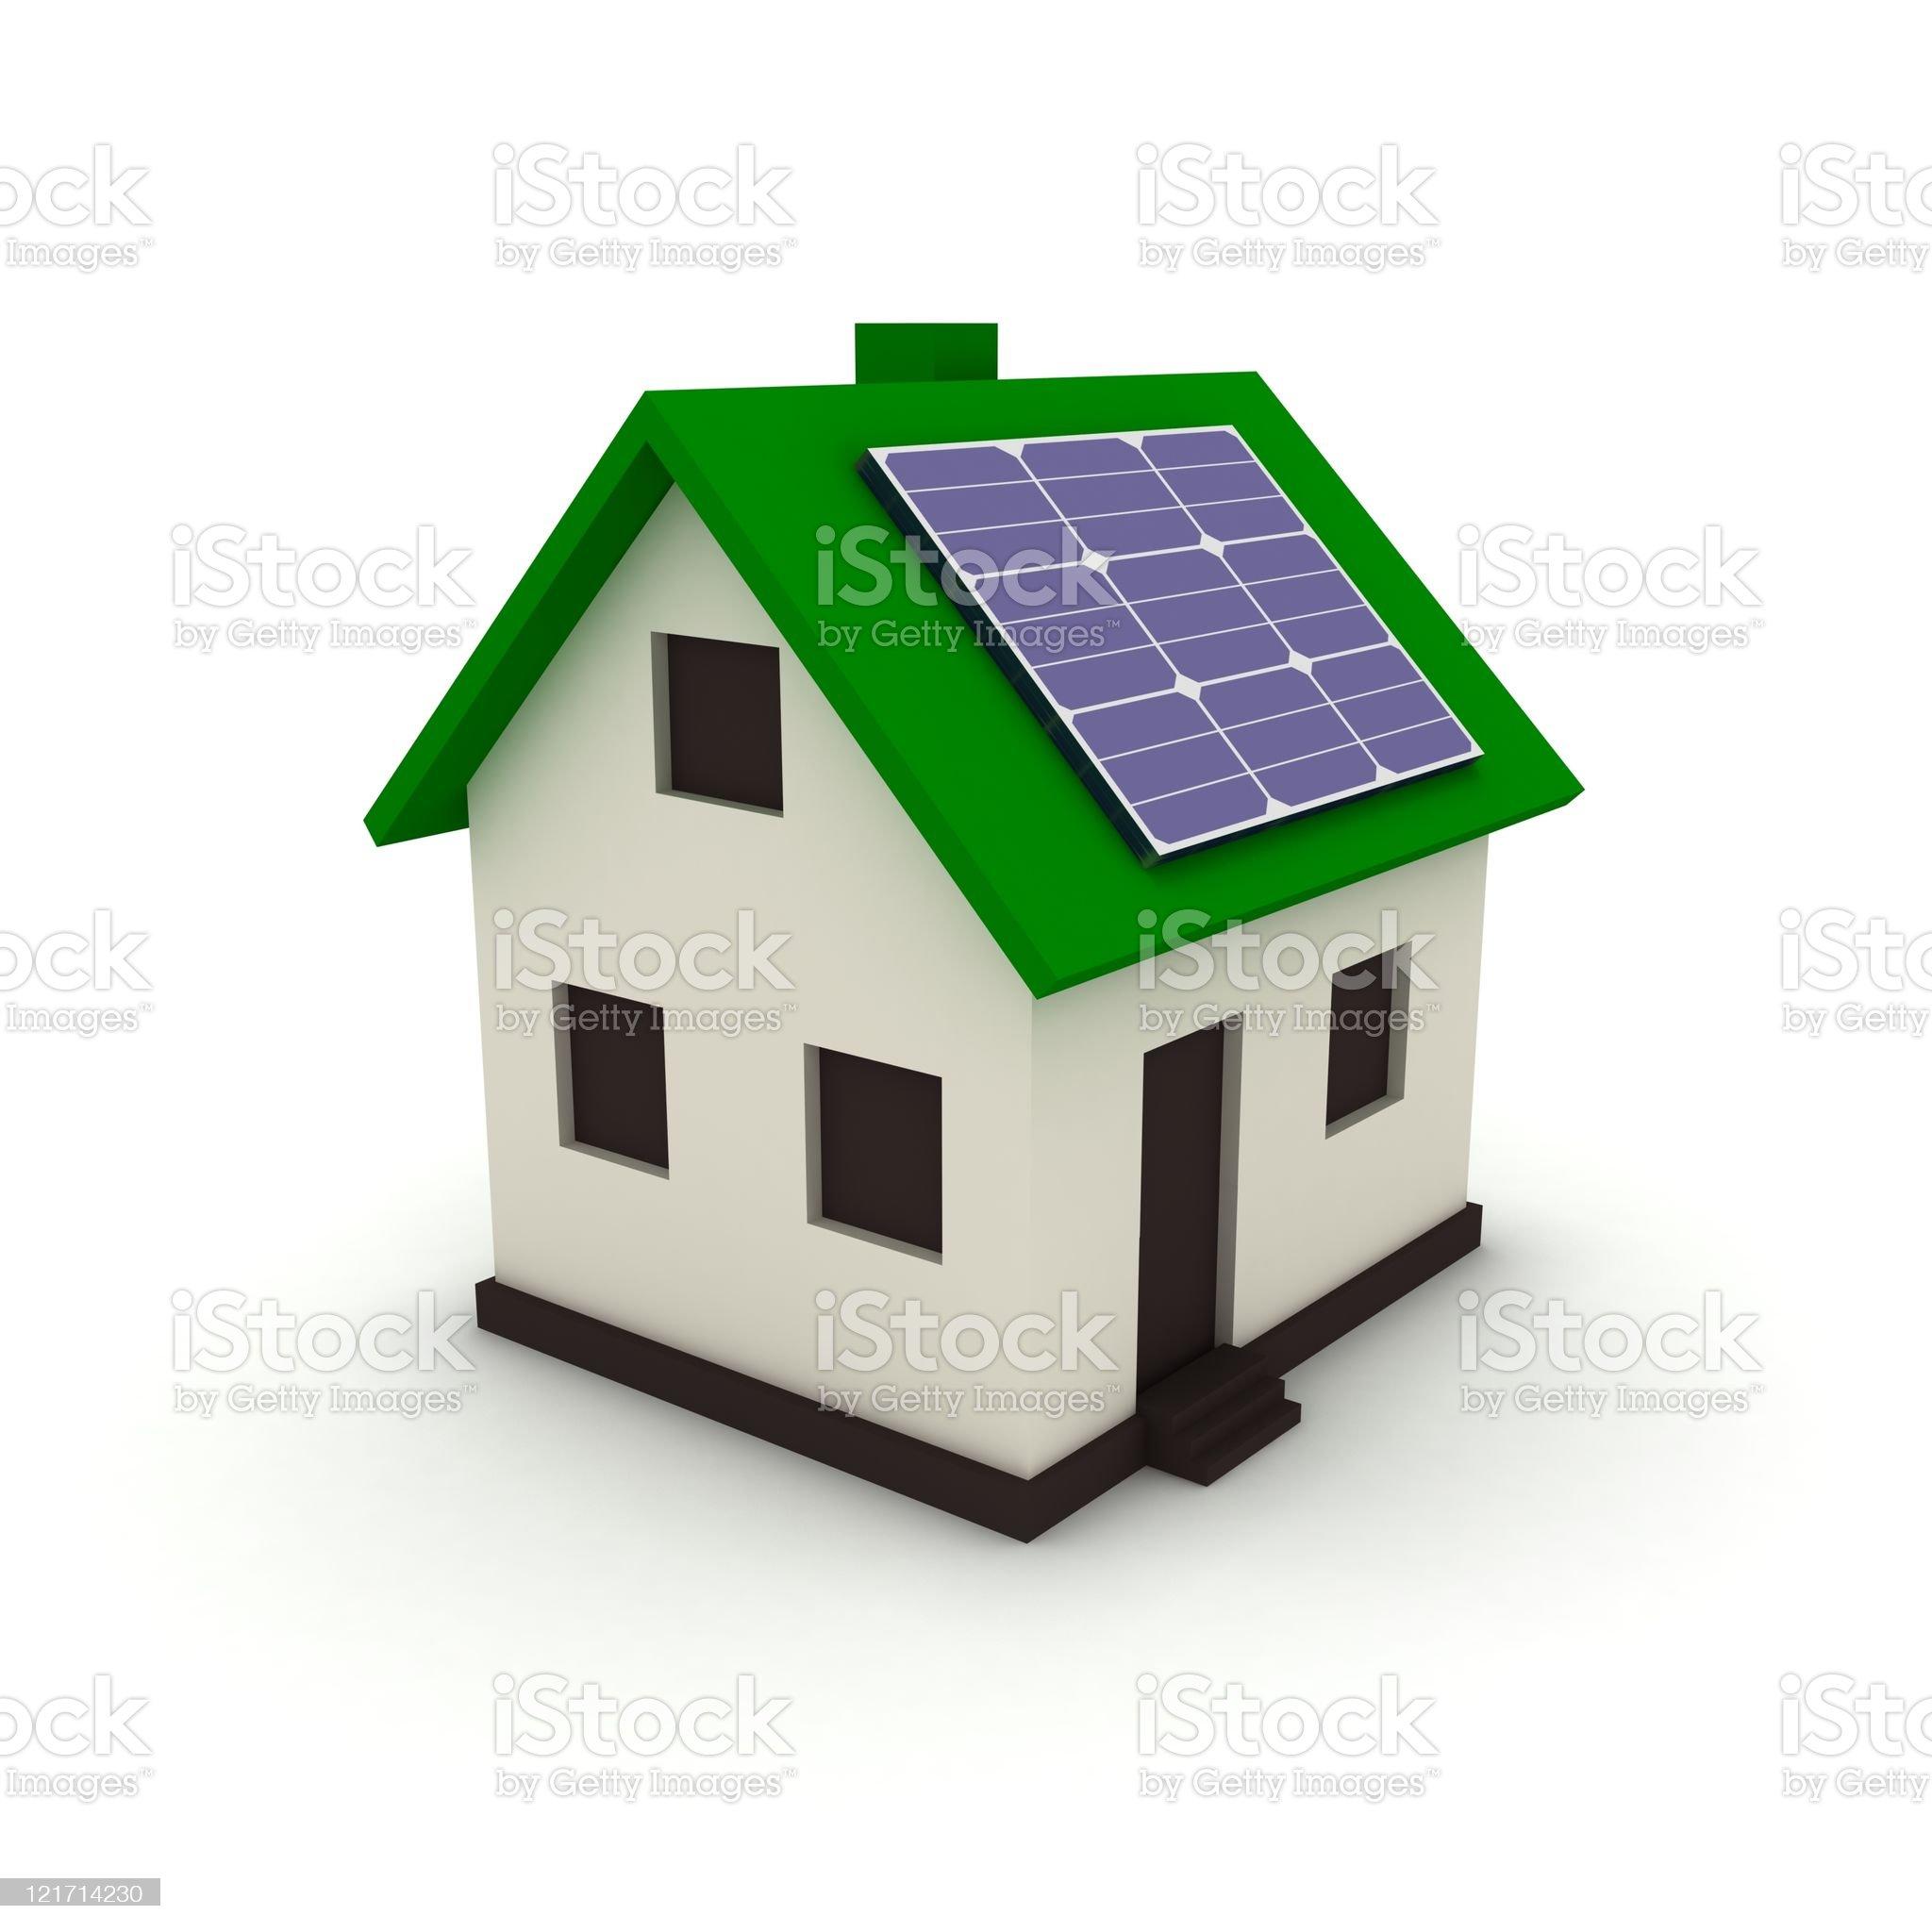 Solar energy smart house royalty-free stock photo